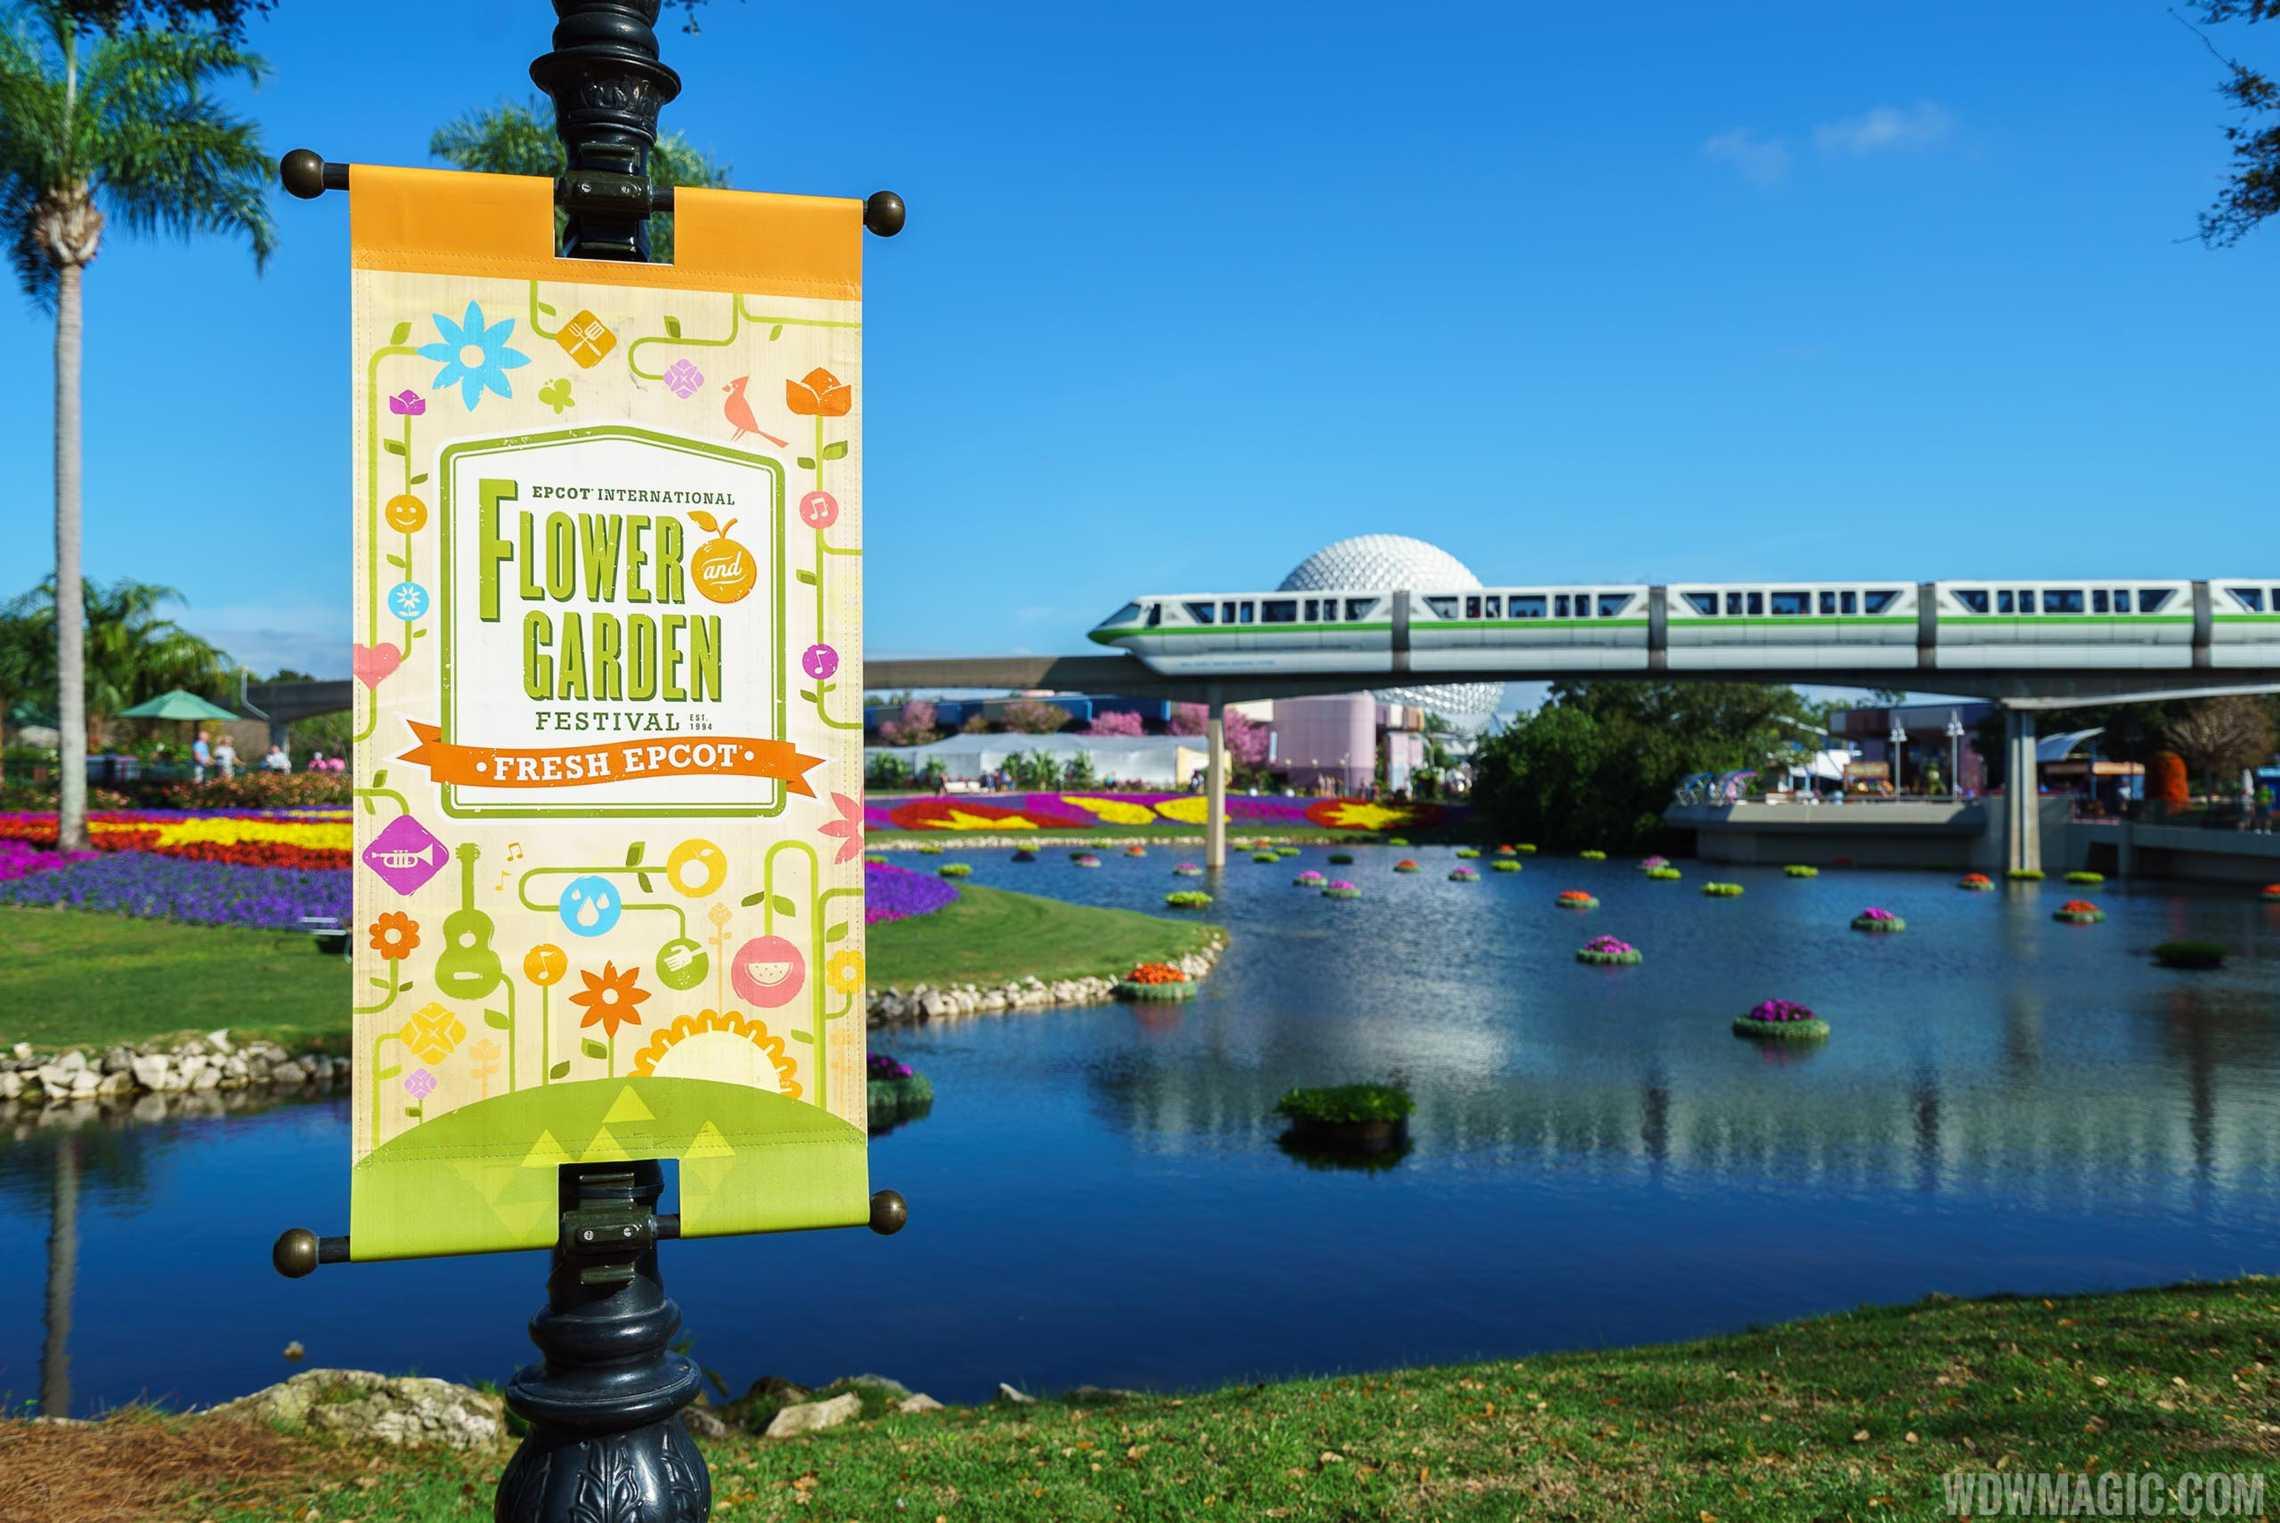 2017 Flower and Garden Festival - Signage